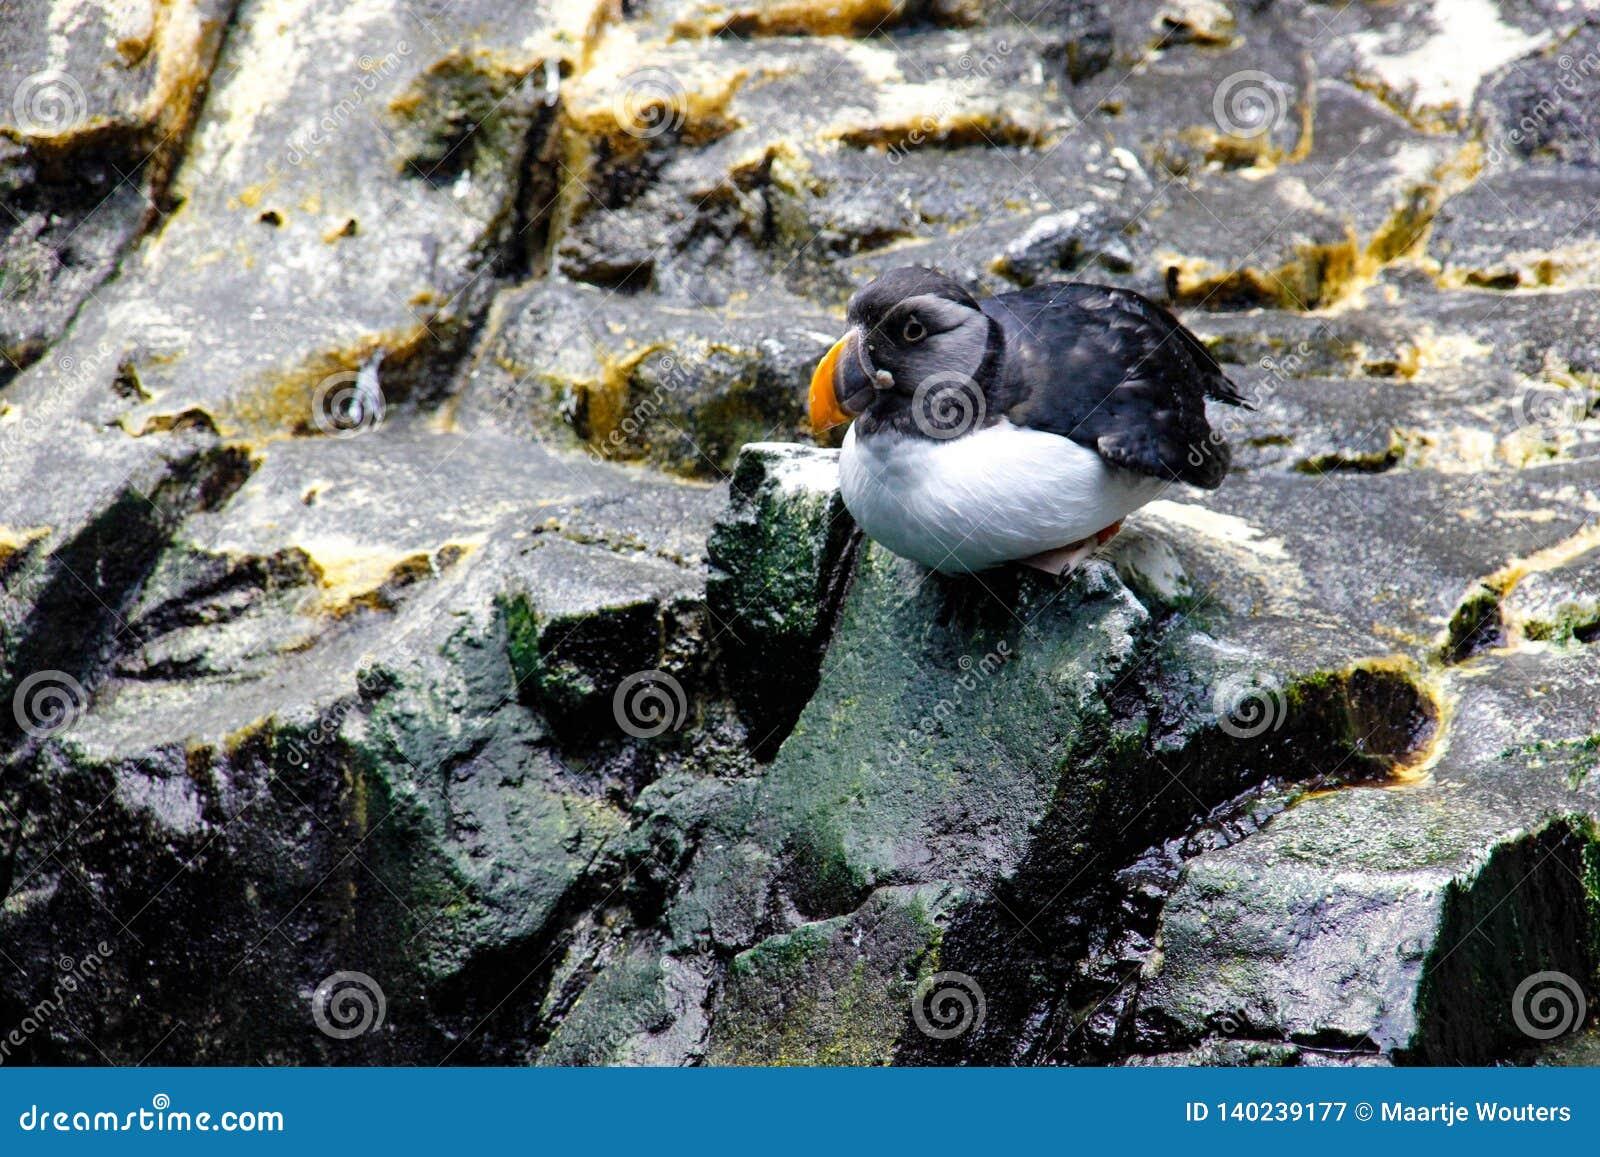 Atlantic puffin sitting on rocks